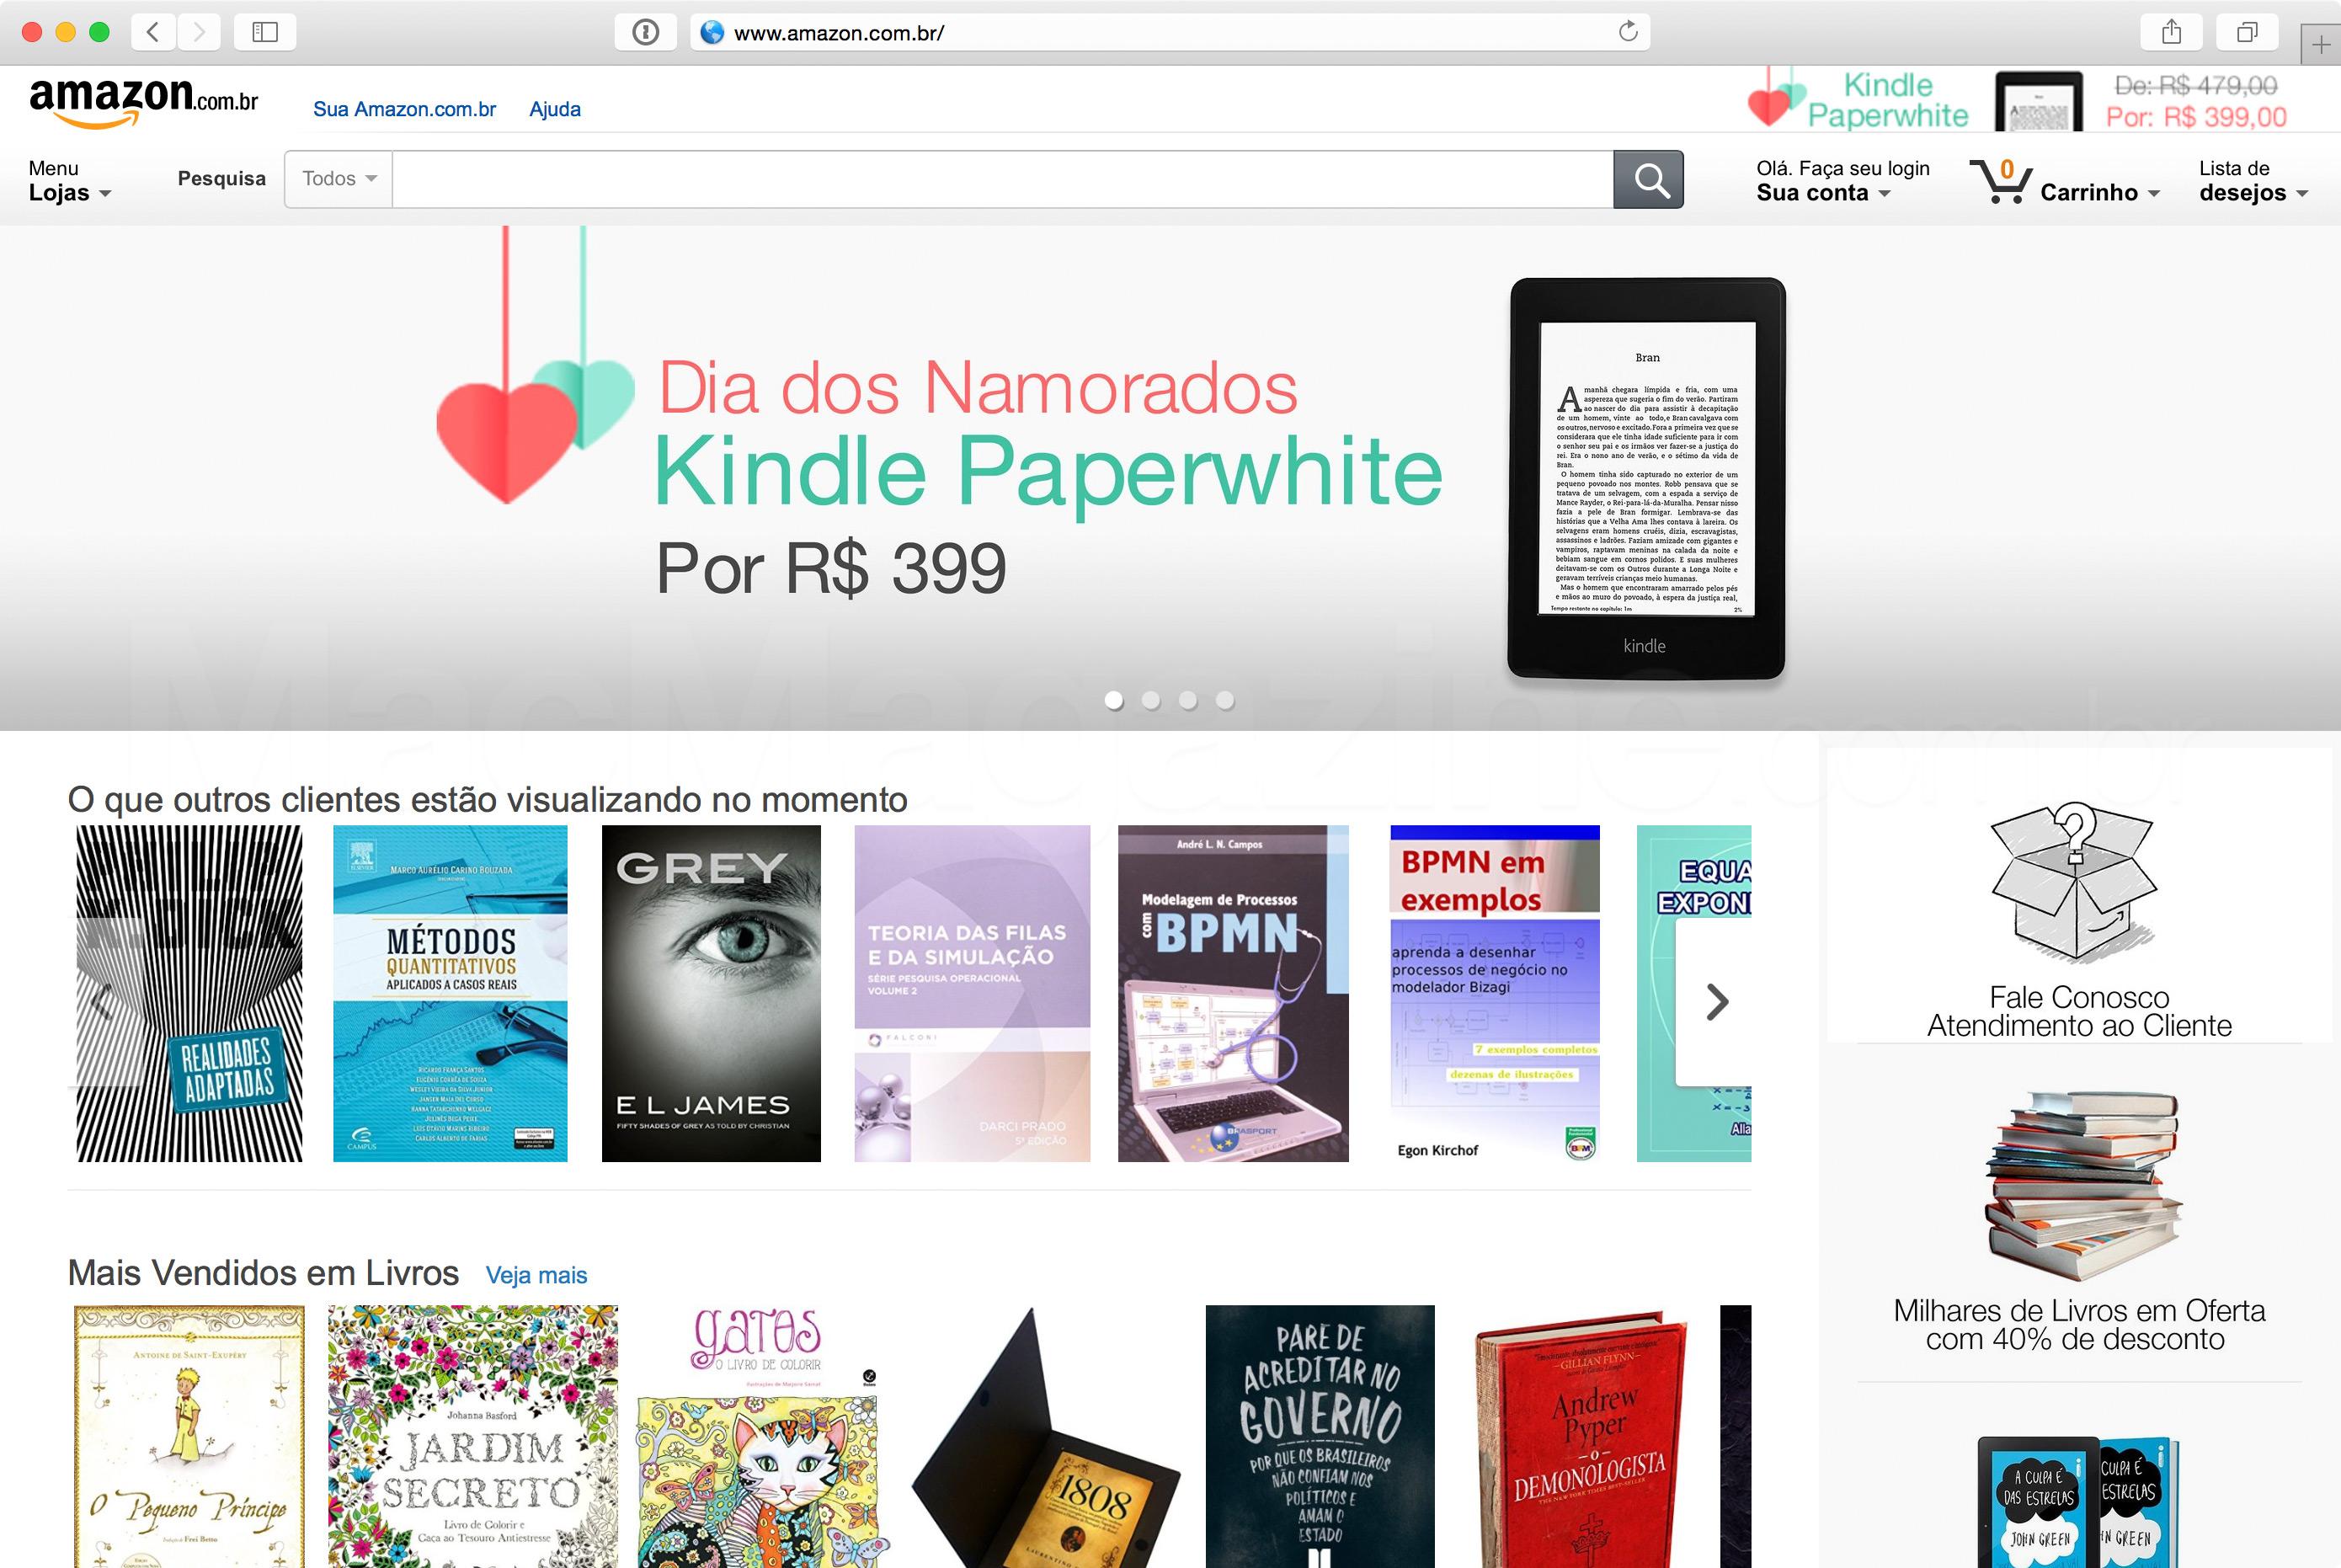 Loja online da Amazon no Brasil